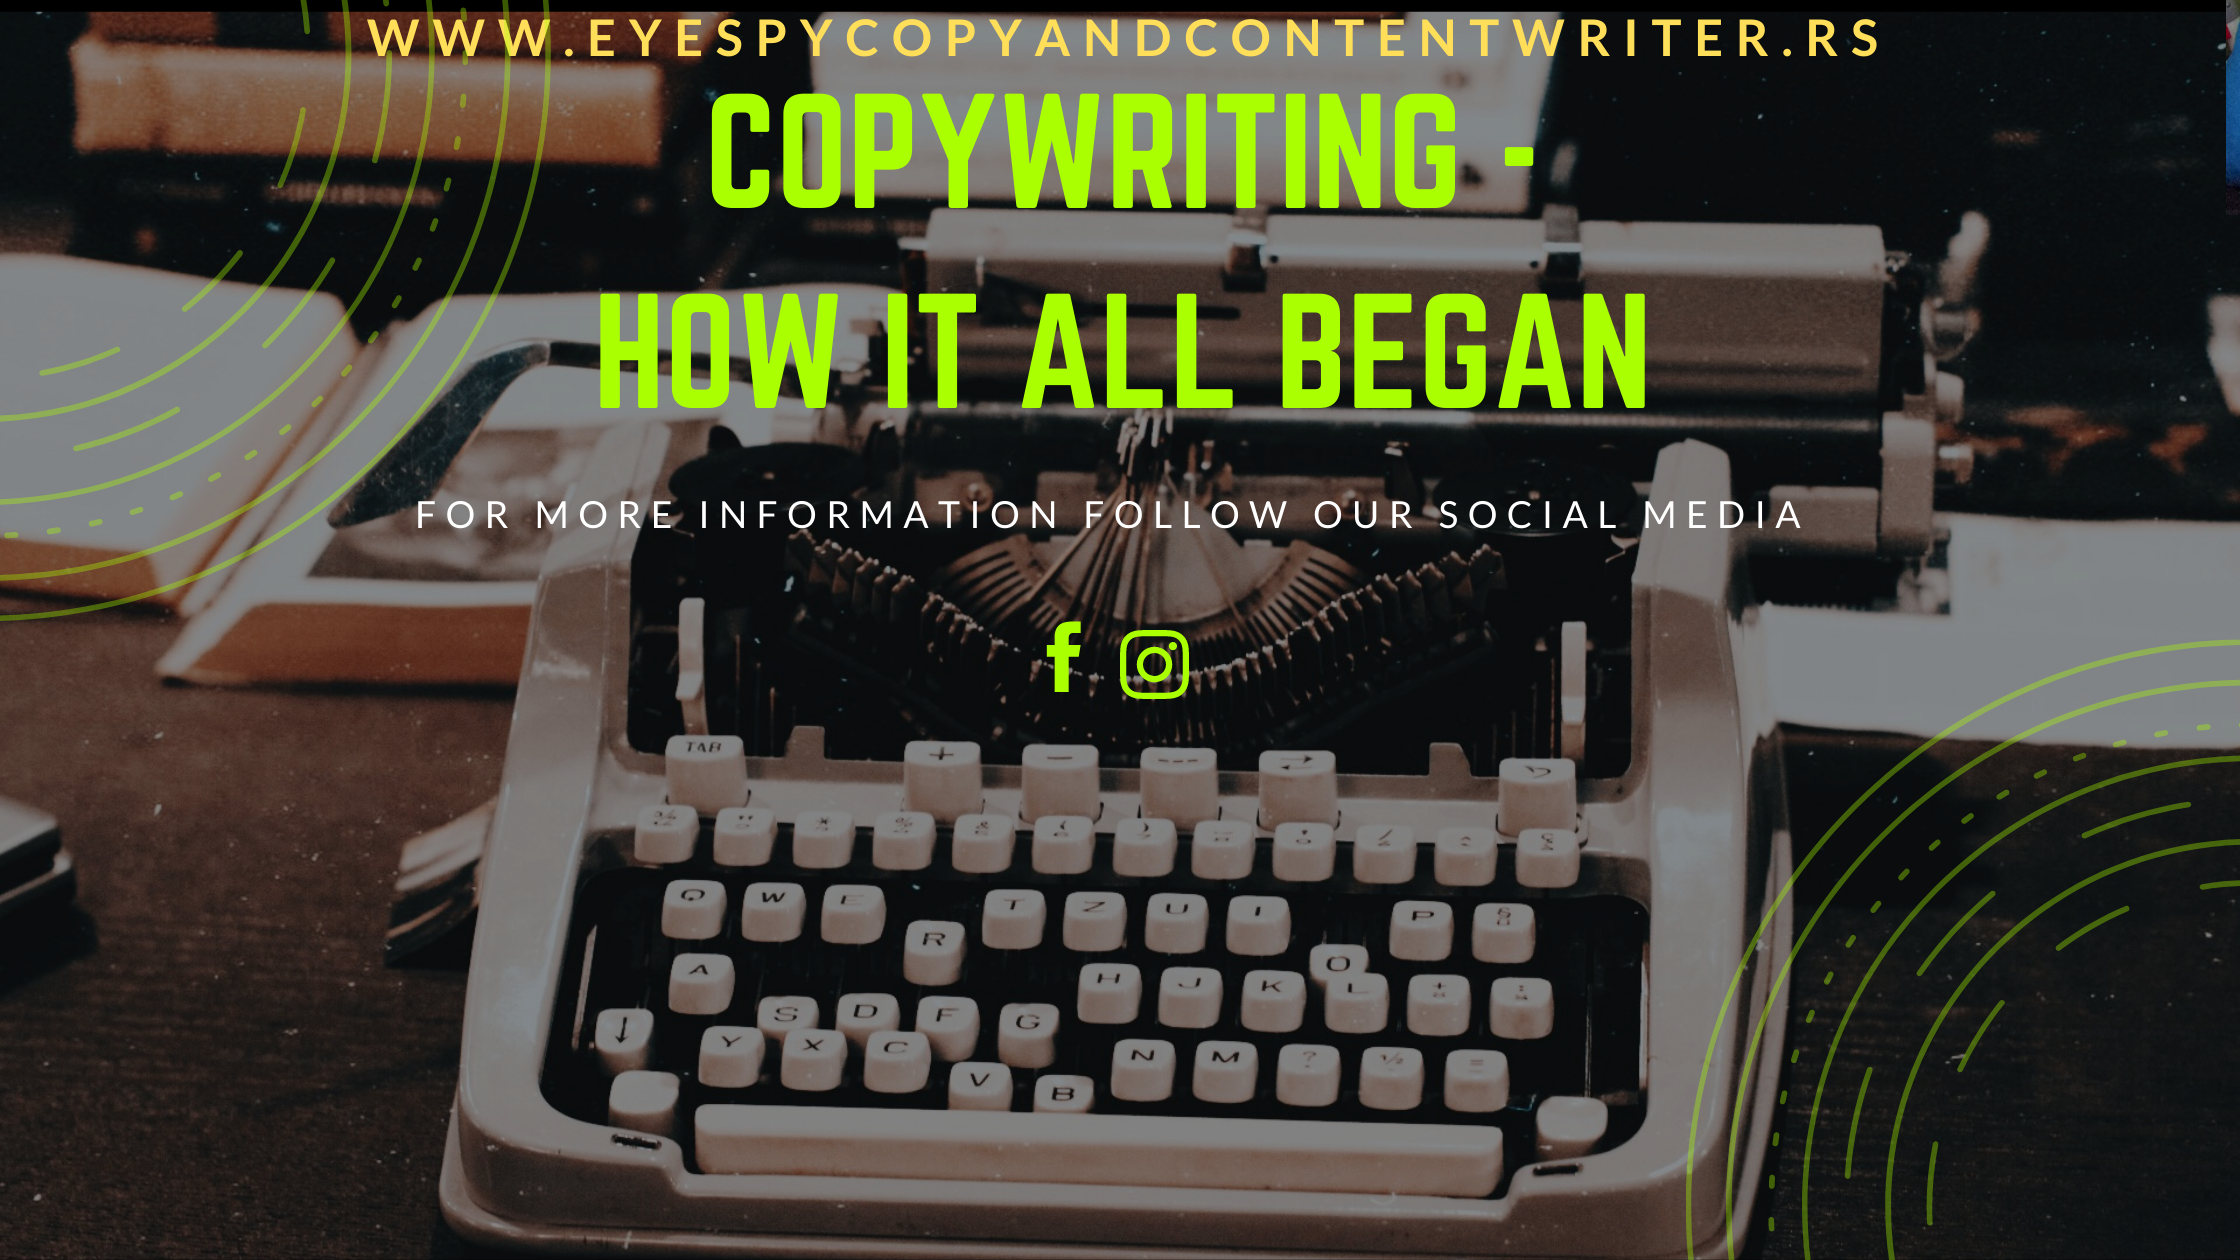 Copywriting — How It All Began